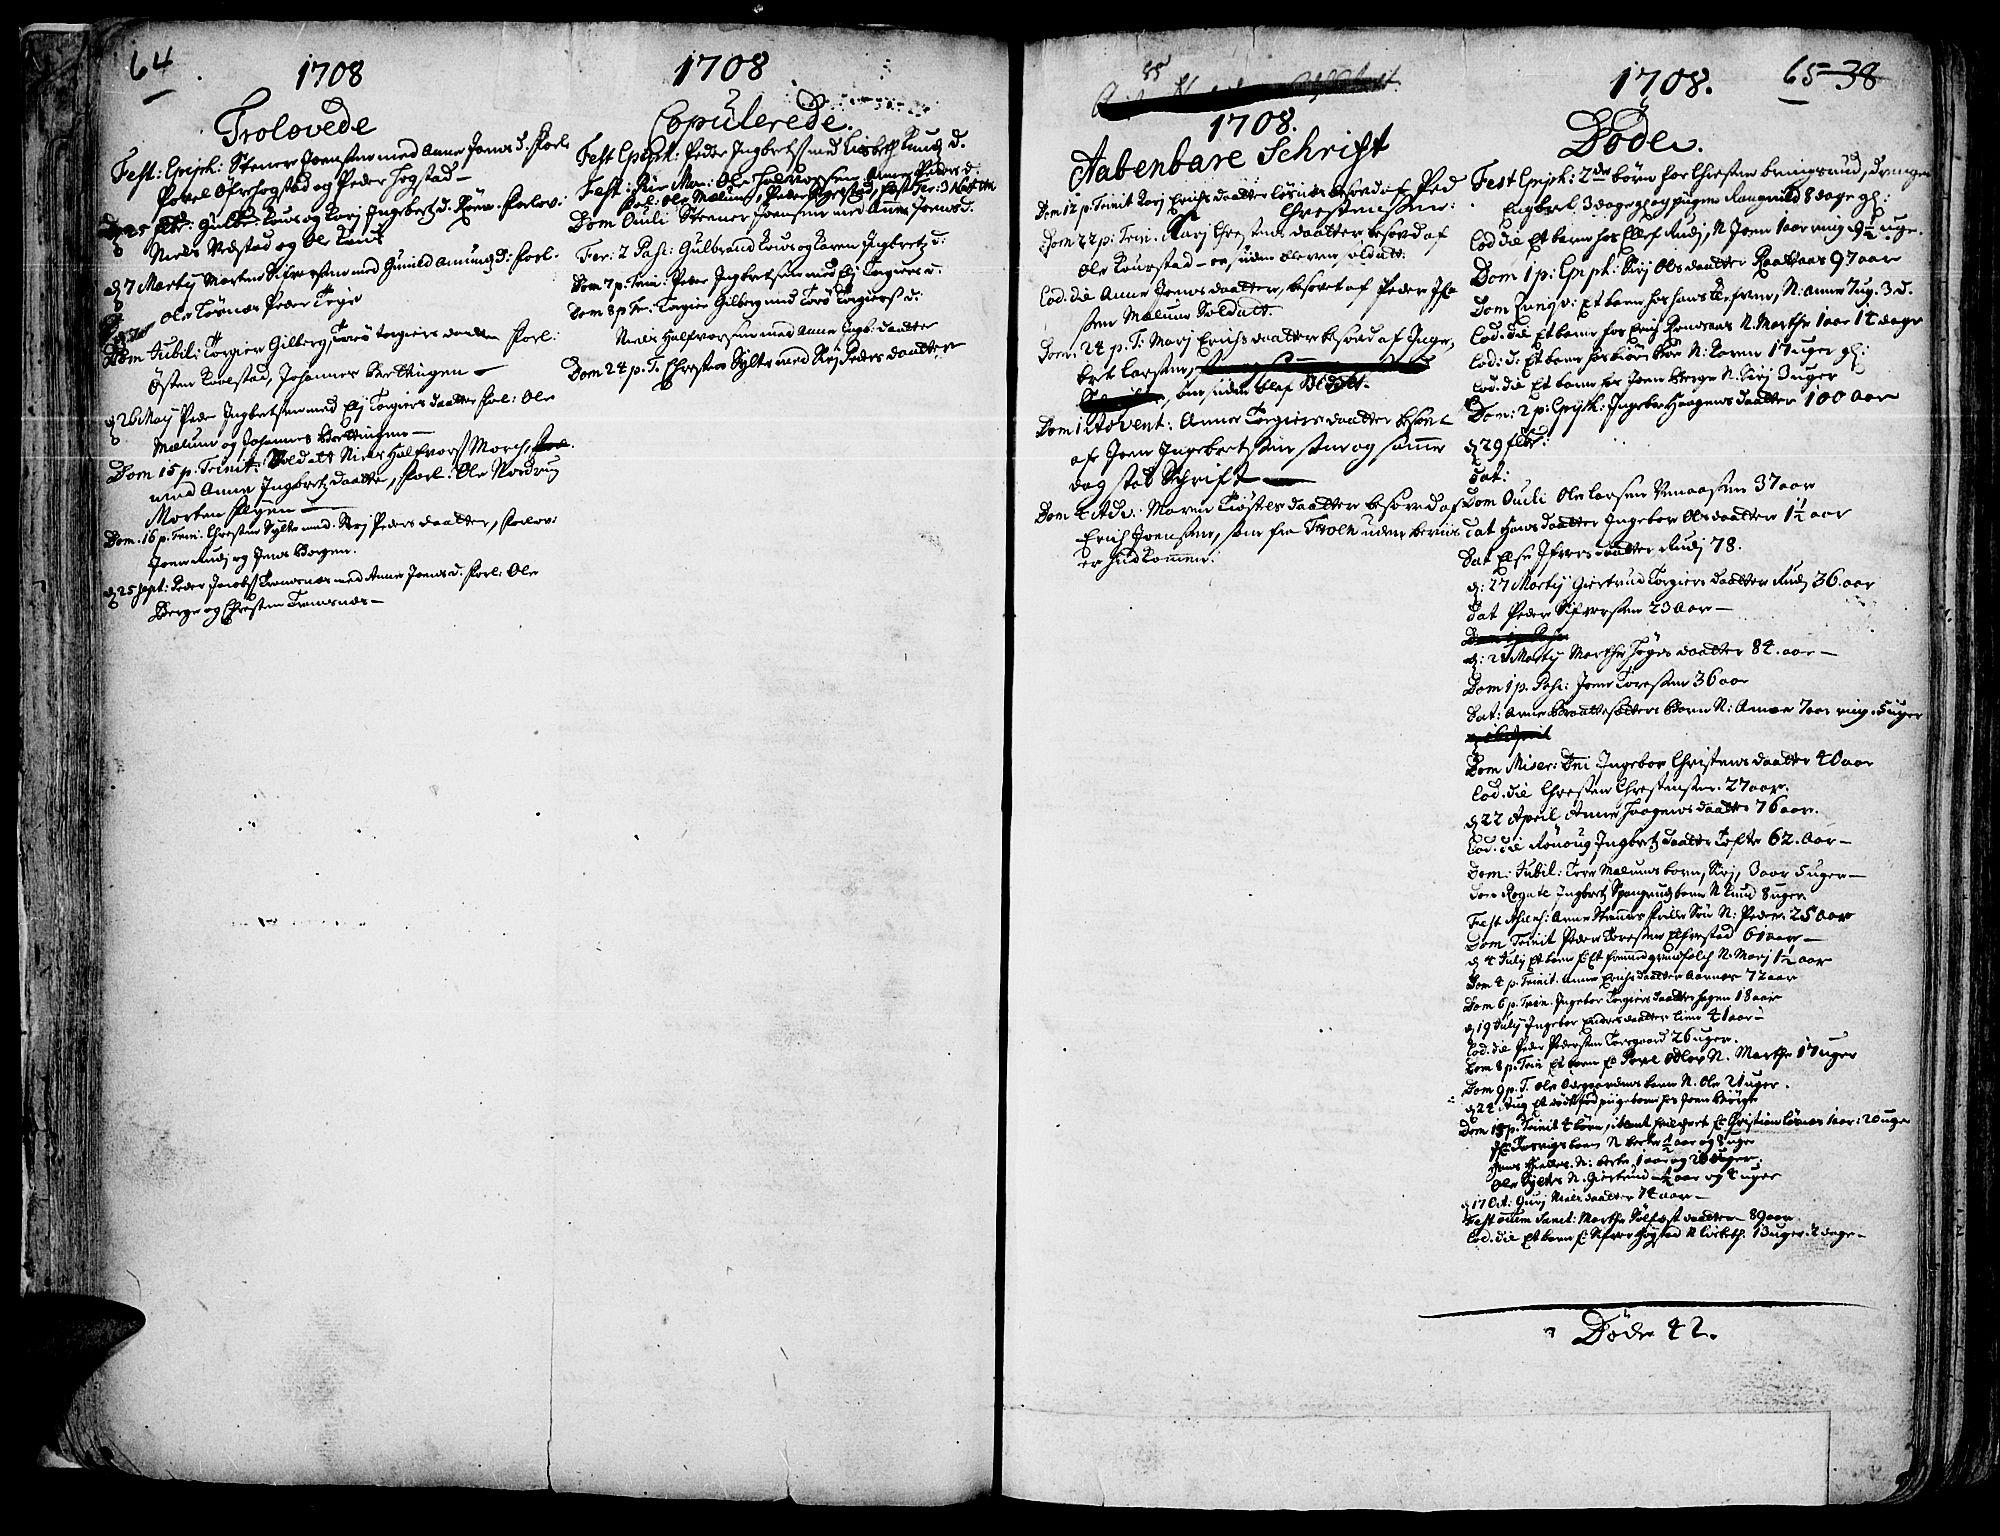 SAH, Ringebu prestekontor, Ministerialbok nr. 1, 1696-1733, s. 64-65